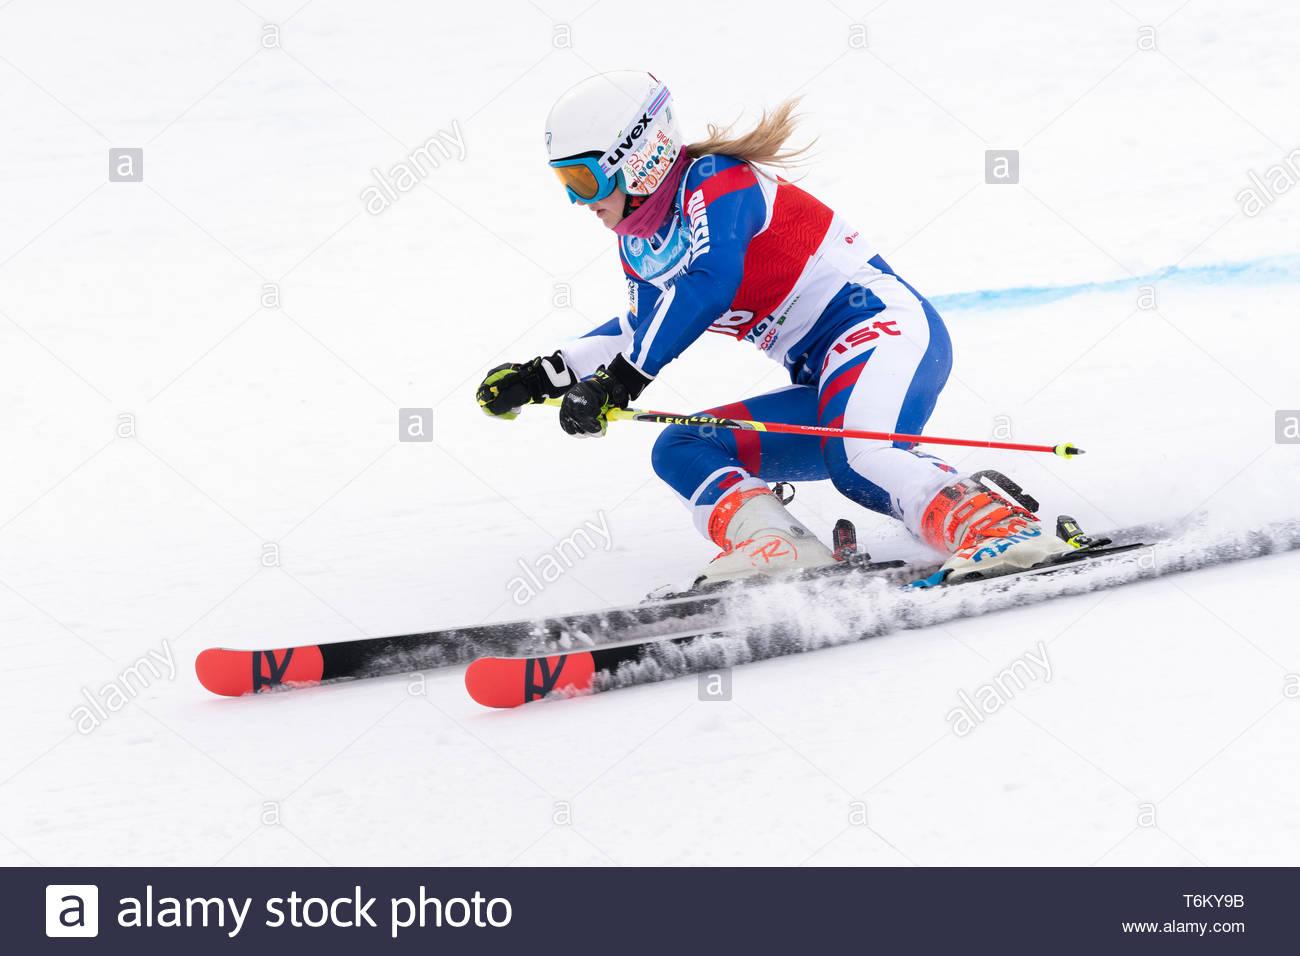 KAMCHATKA, RUSSIA - APR 2, 2019: International Ski Federation Championship, Russian Women's Alpine Skiing Cup giant slalom. Mountain skier Yaroslava P - Stock Image